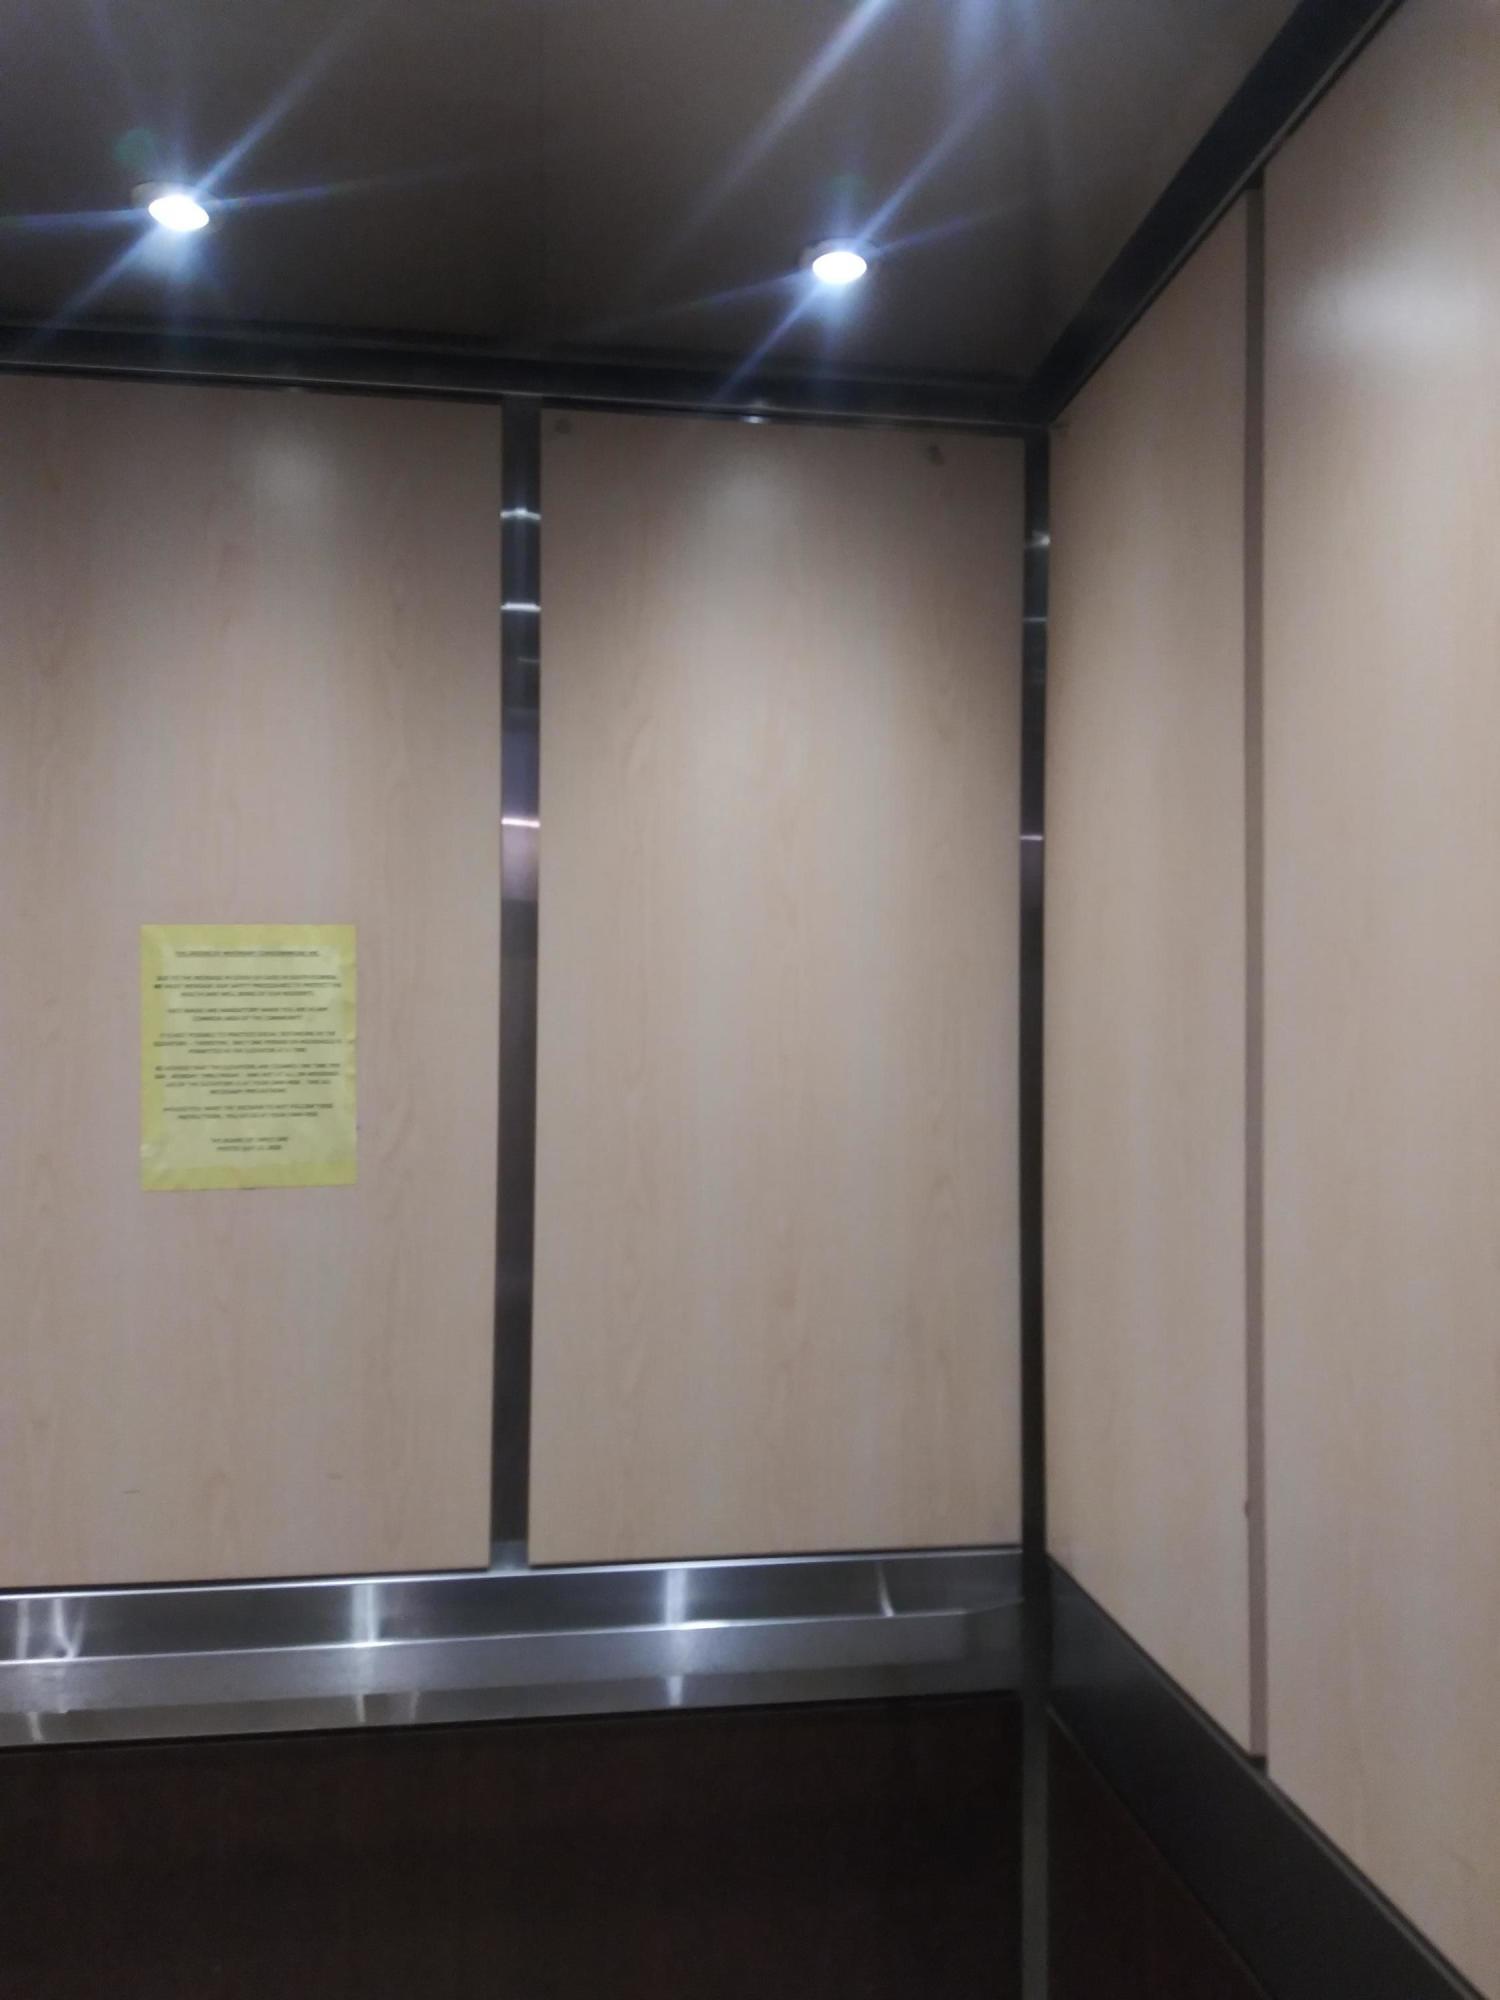 Inside the wide Elevator